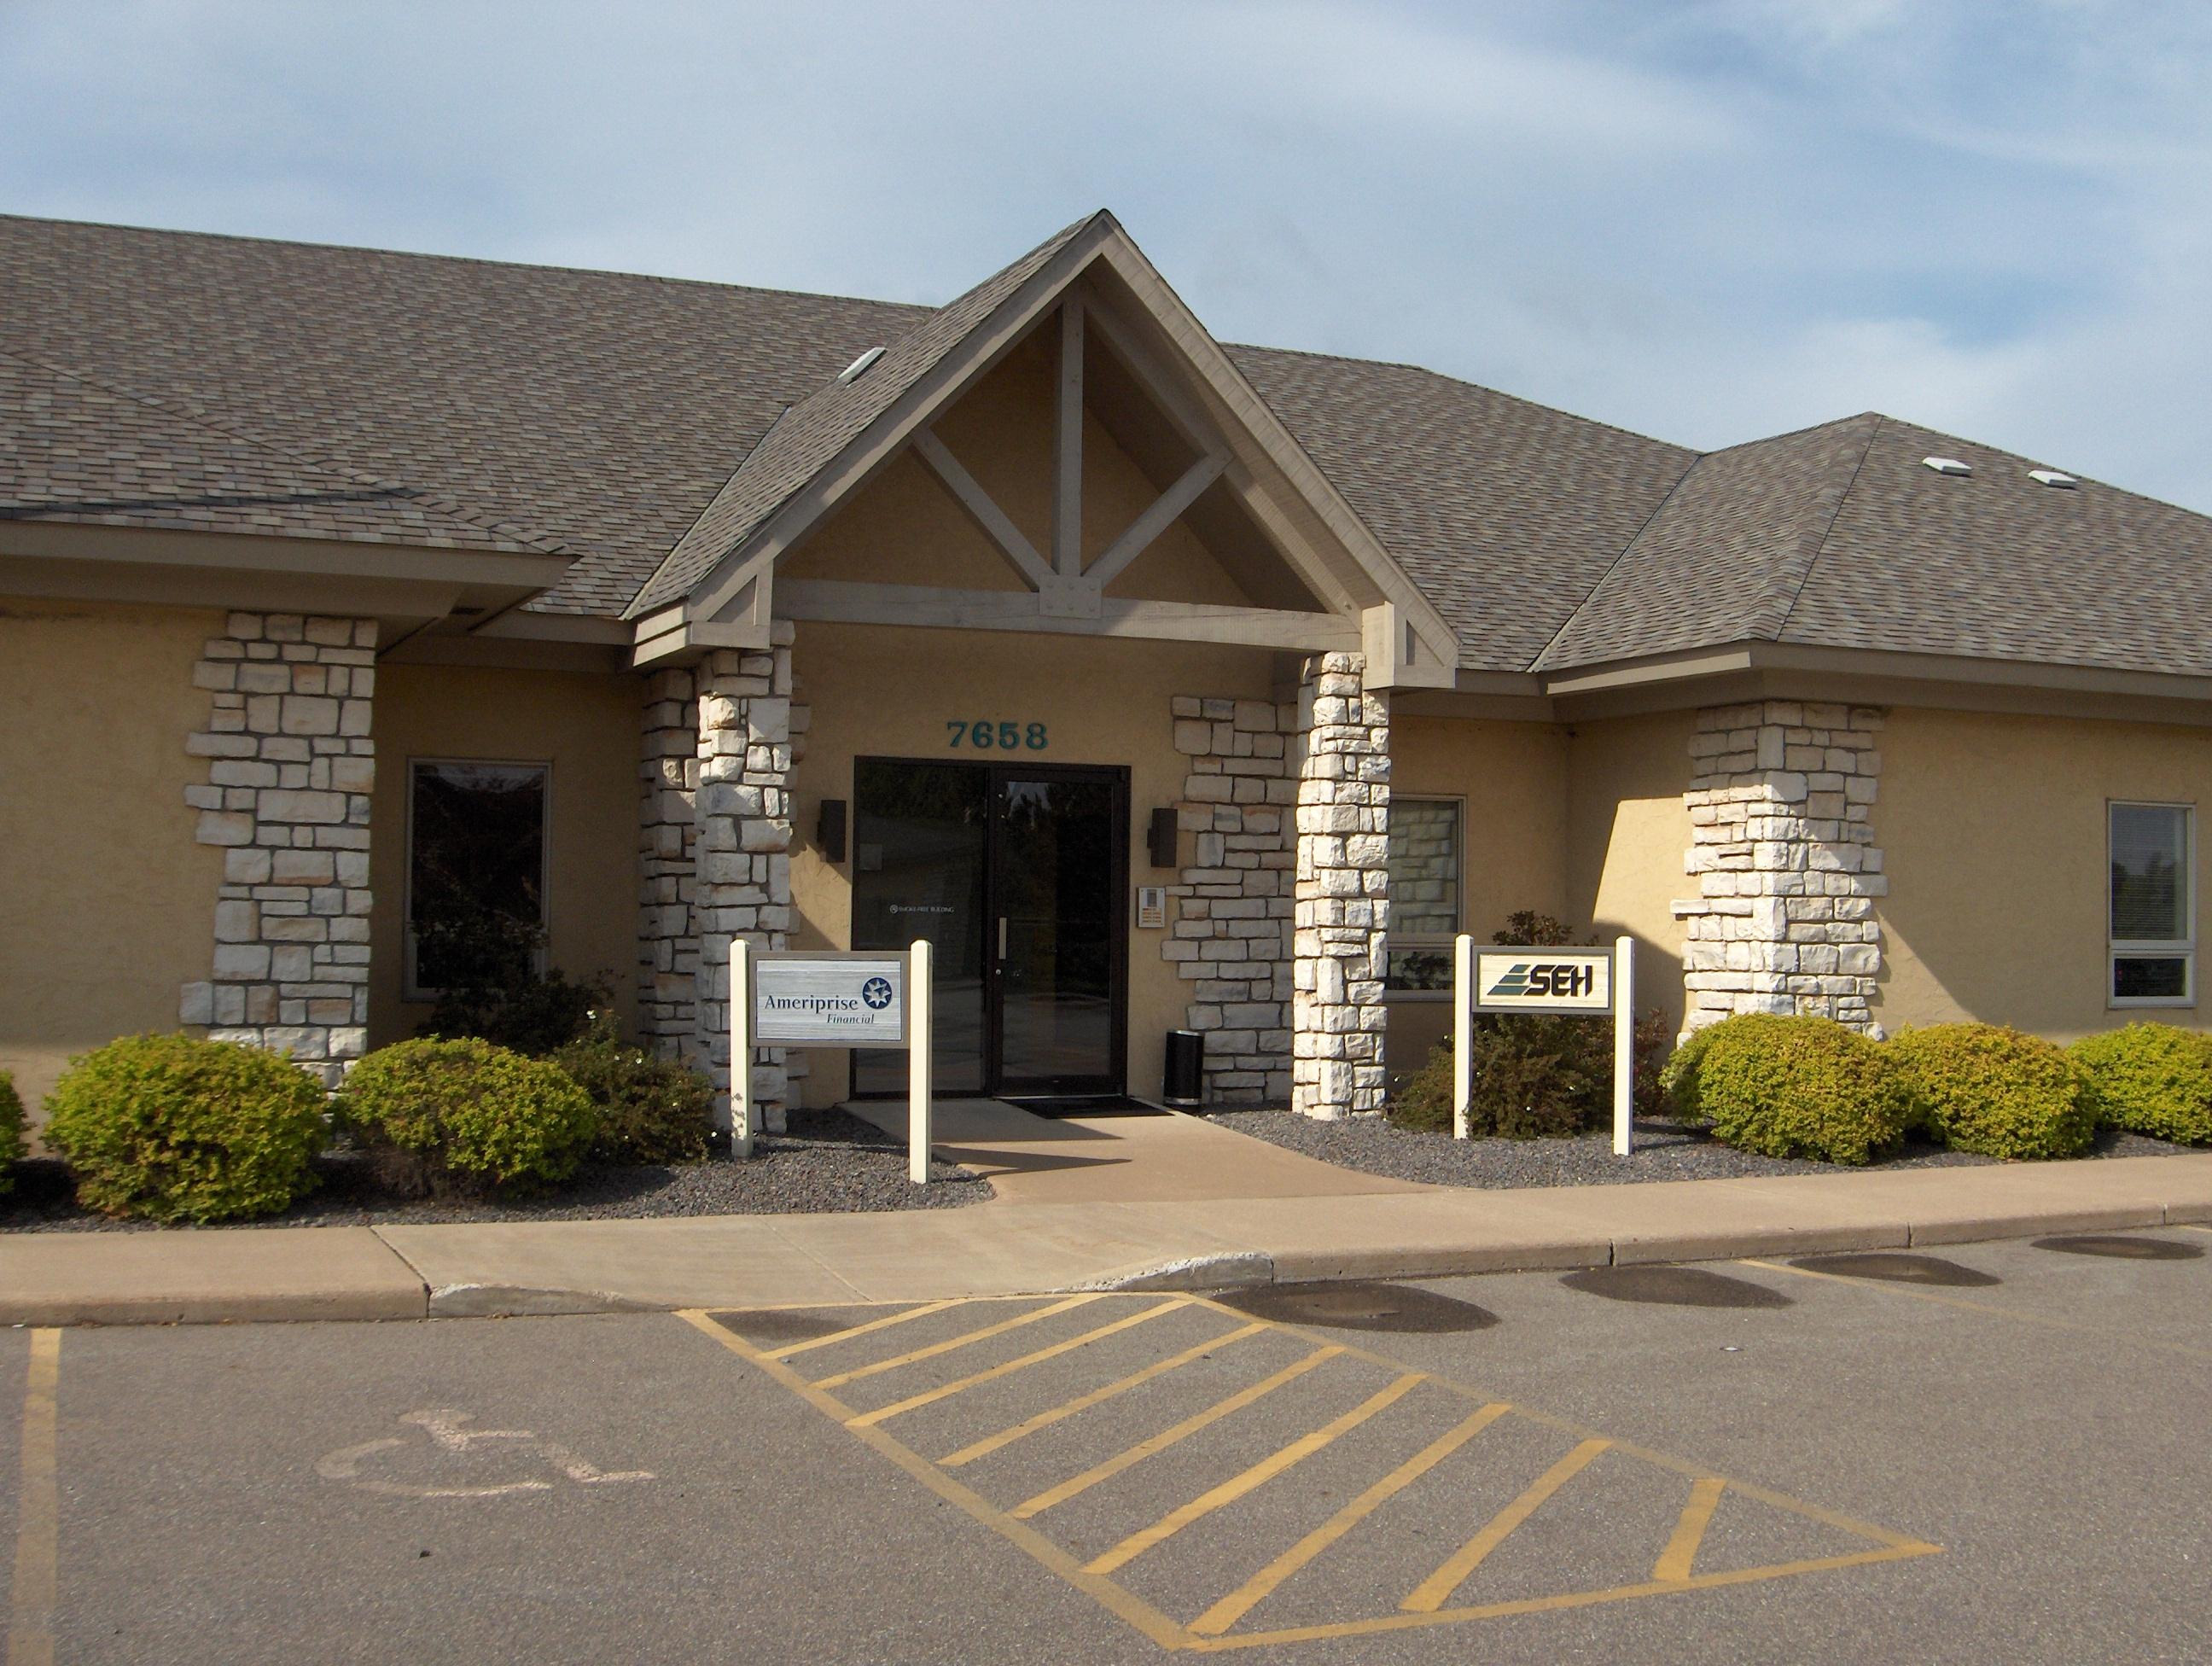 Design Drive Professional Court (Bldg 7658 Ste 100)